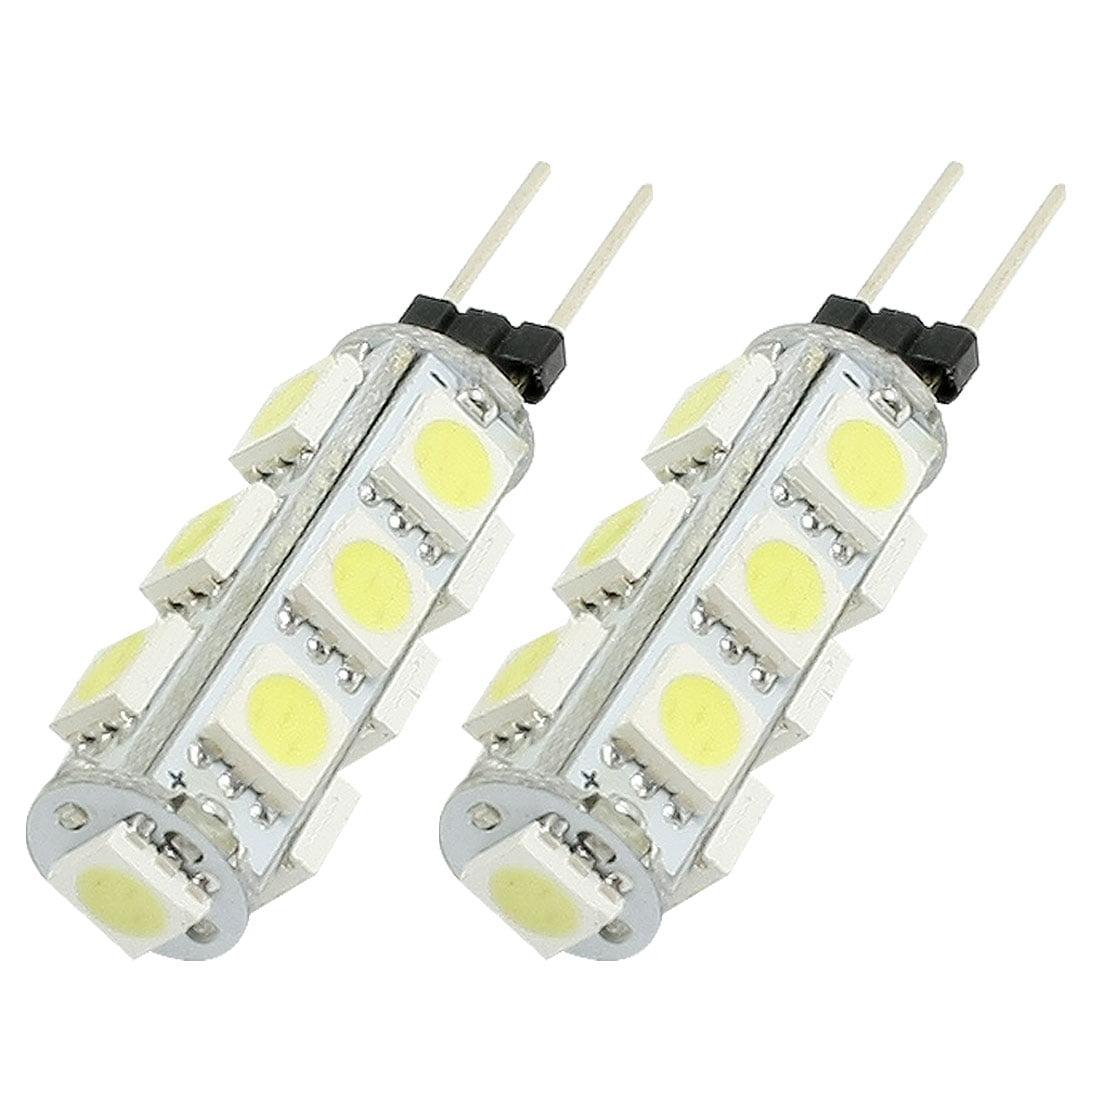 2 Pcs Auto Car G4 White 5050 13 SMD LED Light Dashboard Lamp Bulb